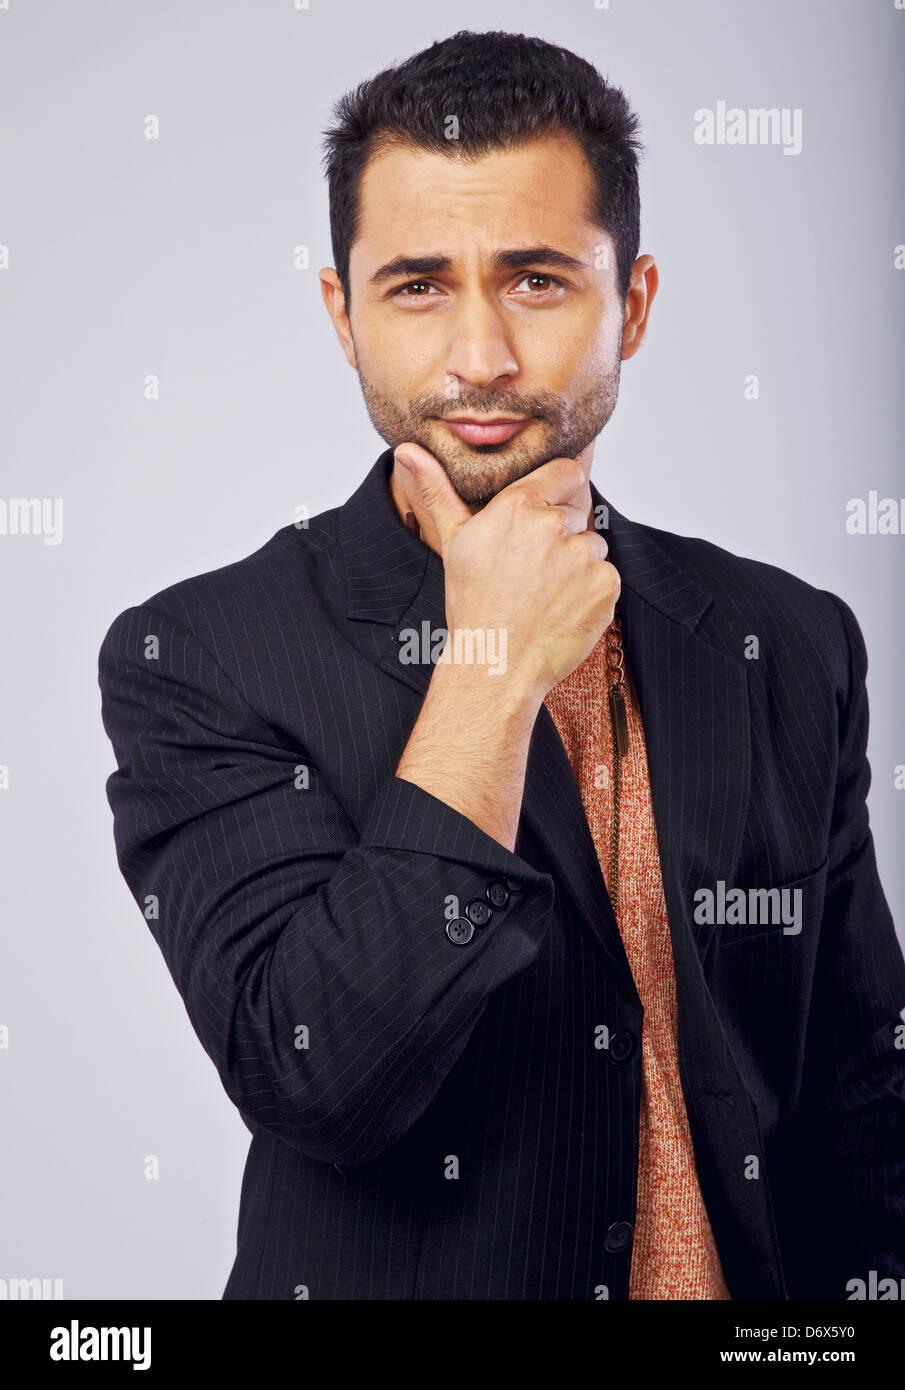 Arrogant handsome man posing in a studio - Stock Image